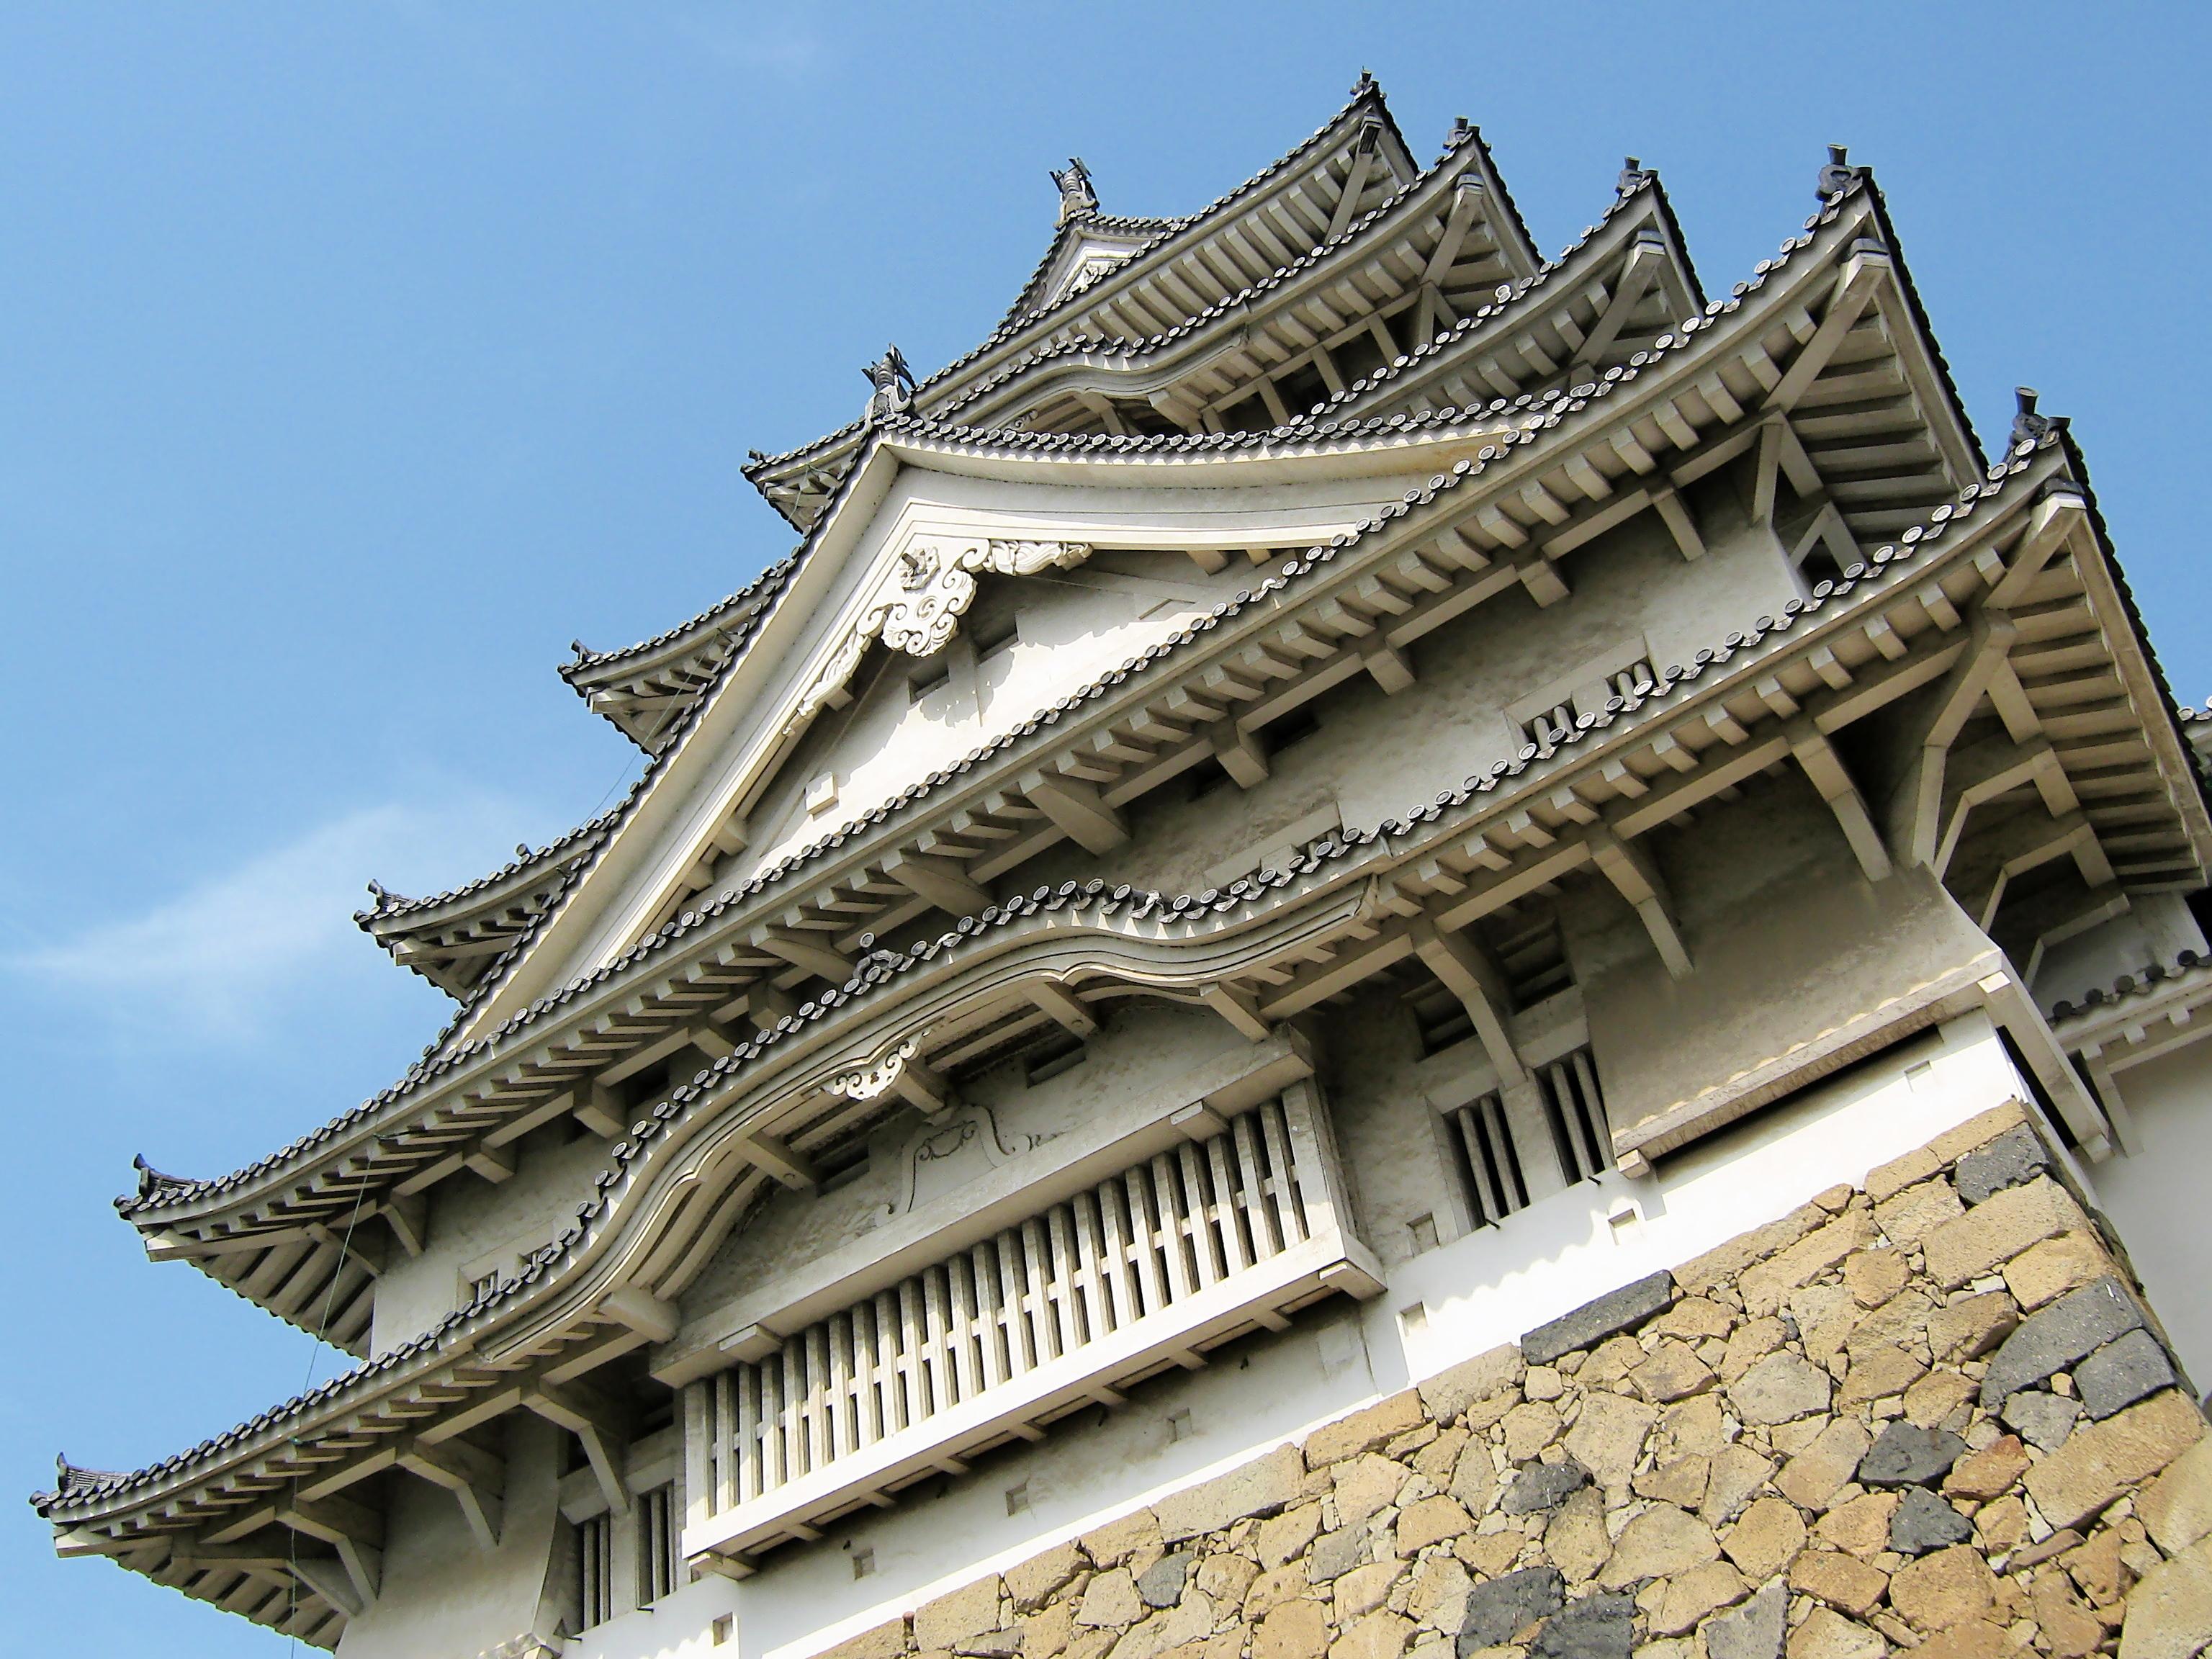 File:Flickr - yeowatzup - Himeji Castle, Himeji, Hyogo, Japan.jpg